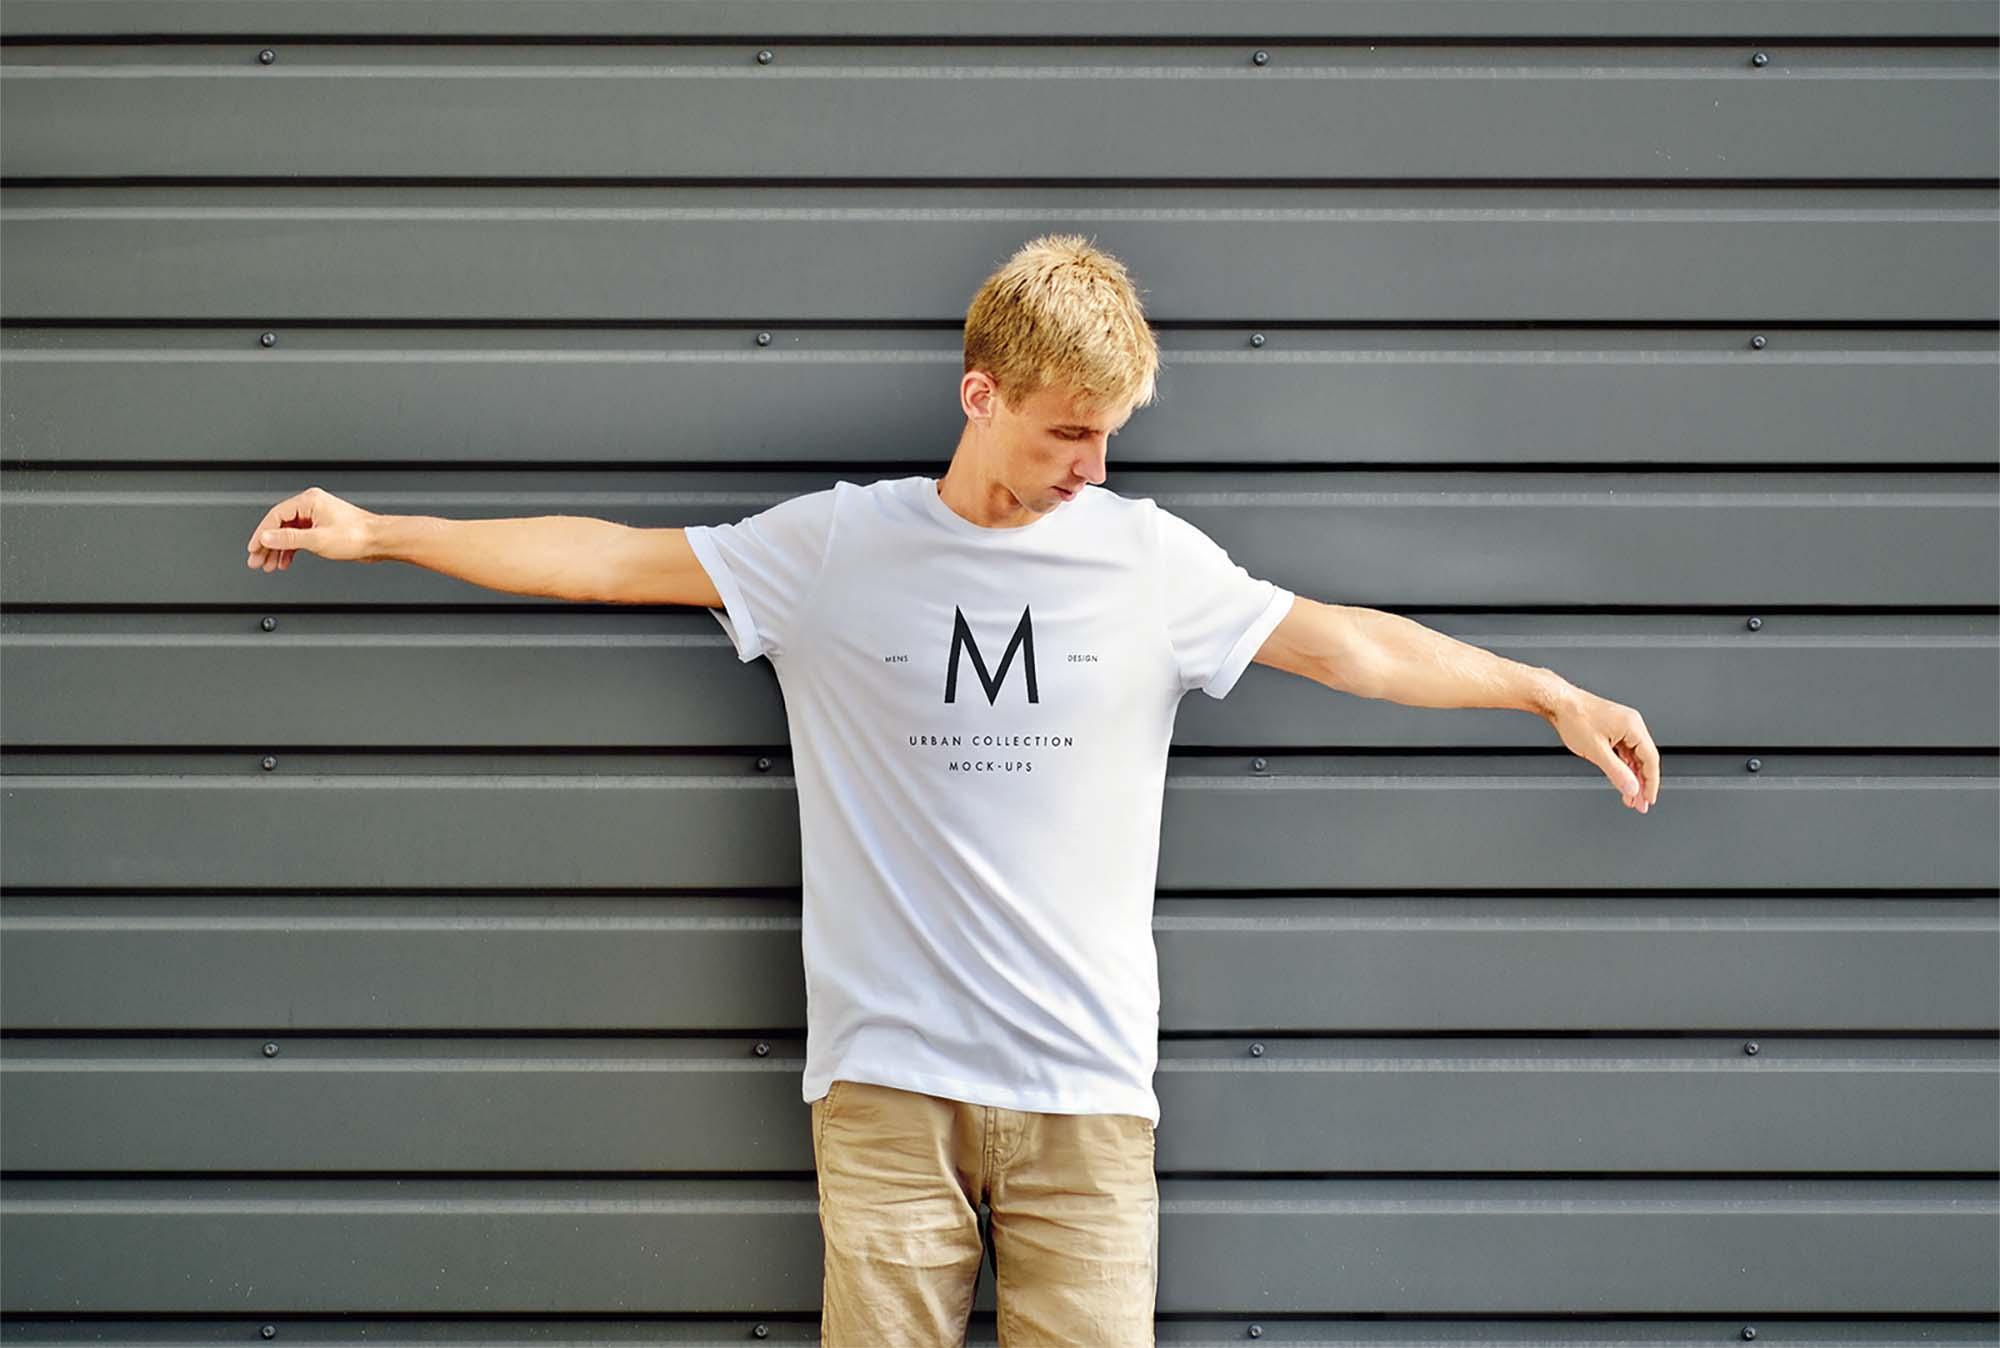 Urban T-Shirt Mockup 3